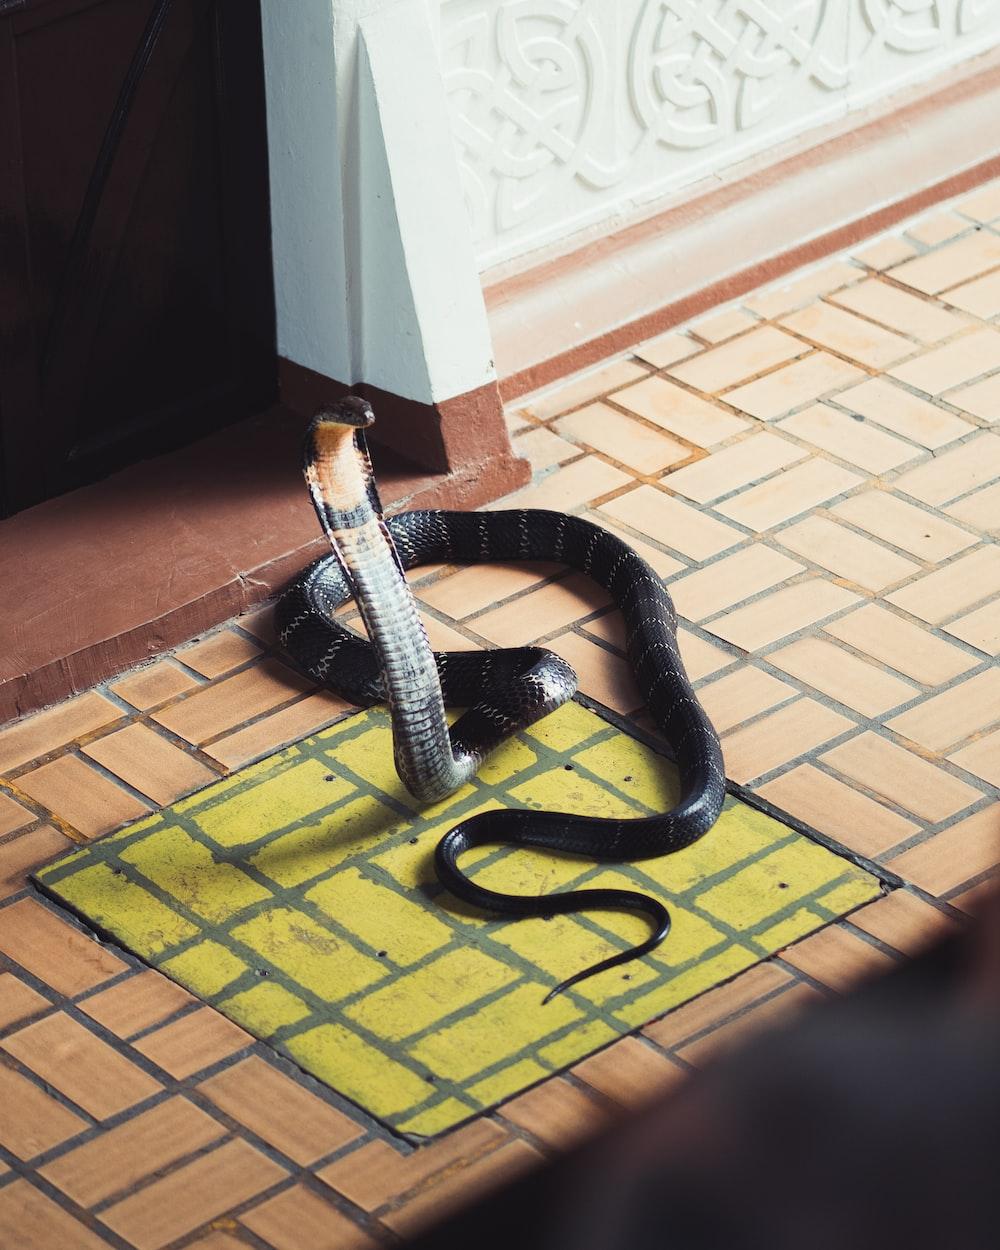 black and white snake on brown floor